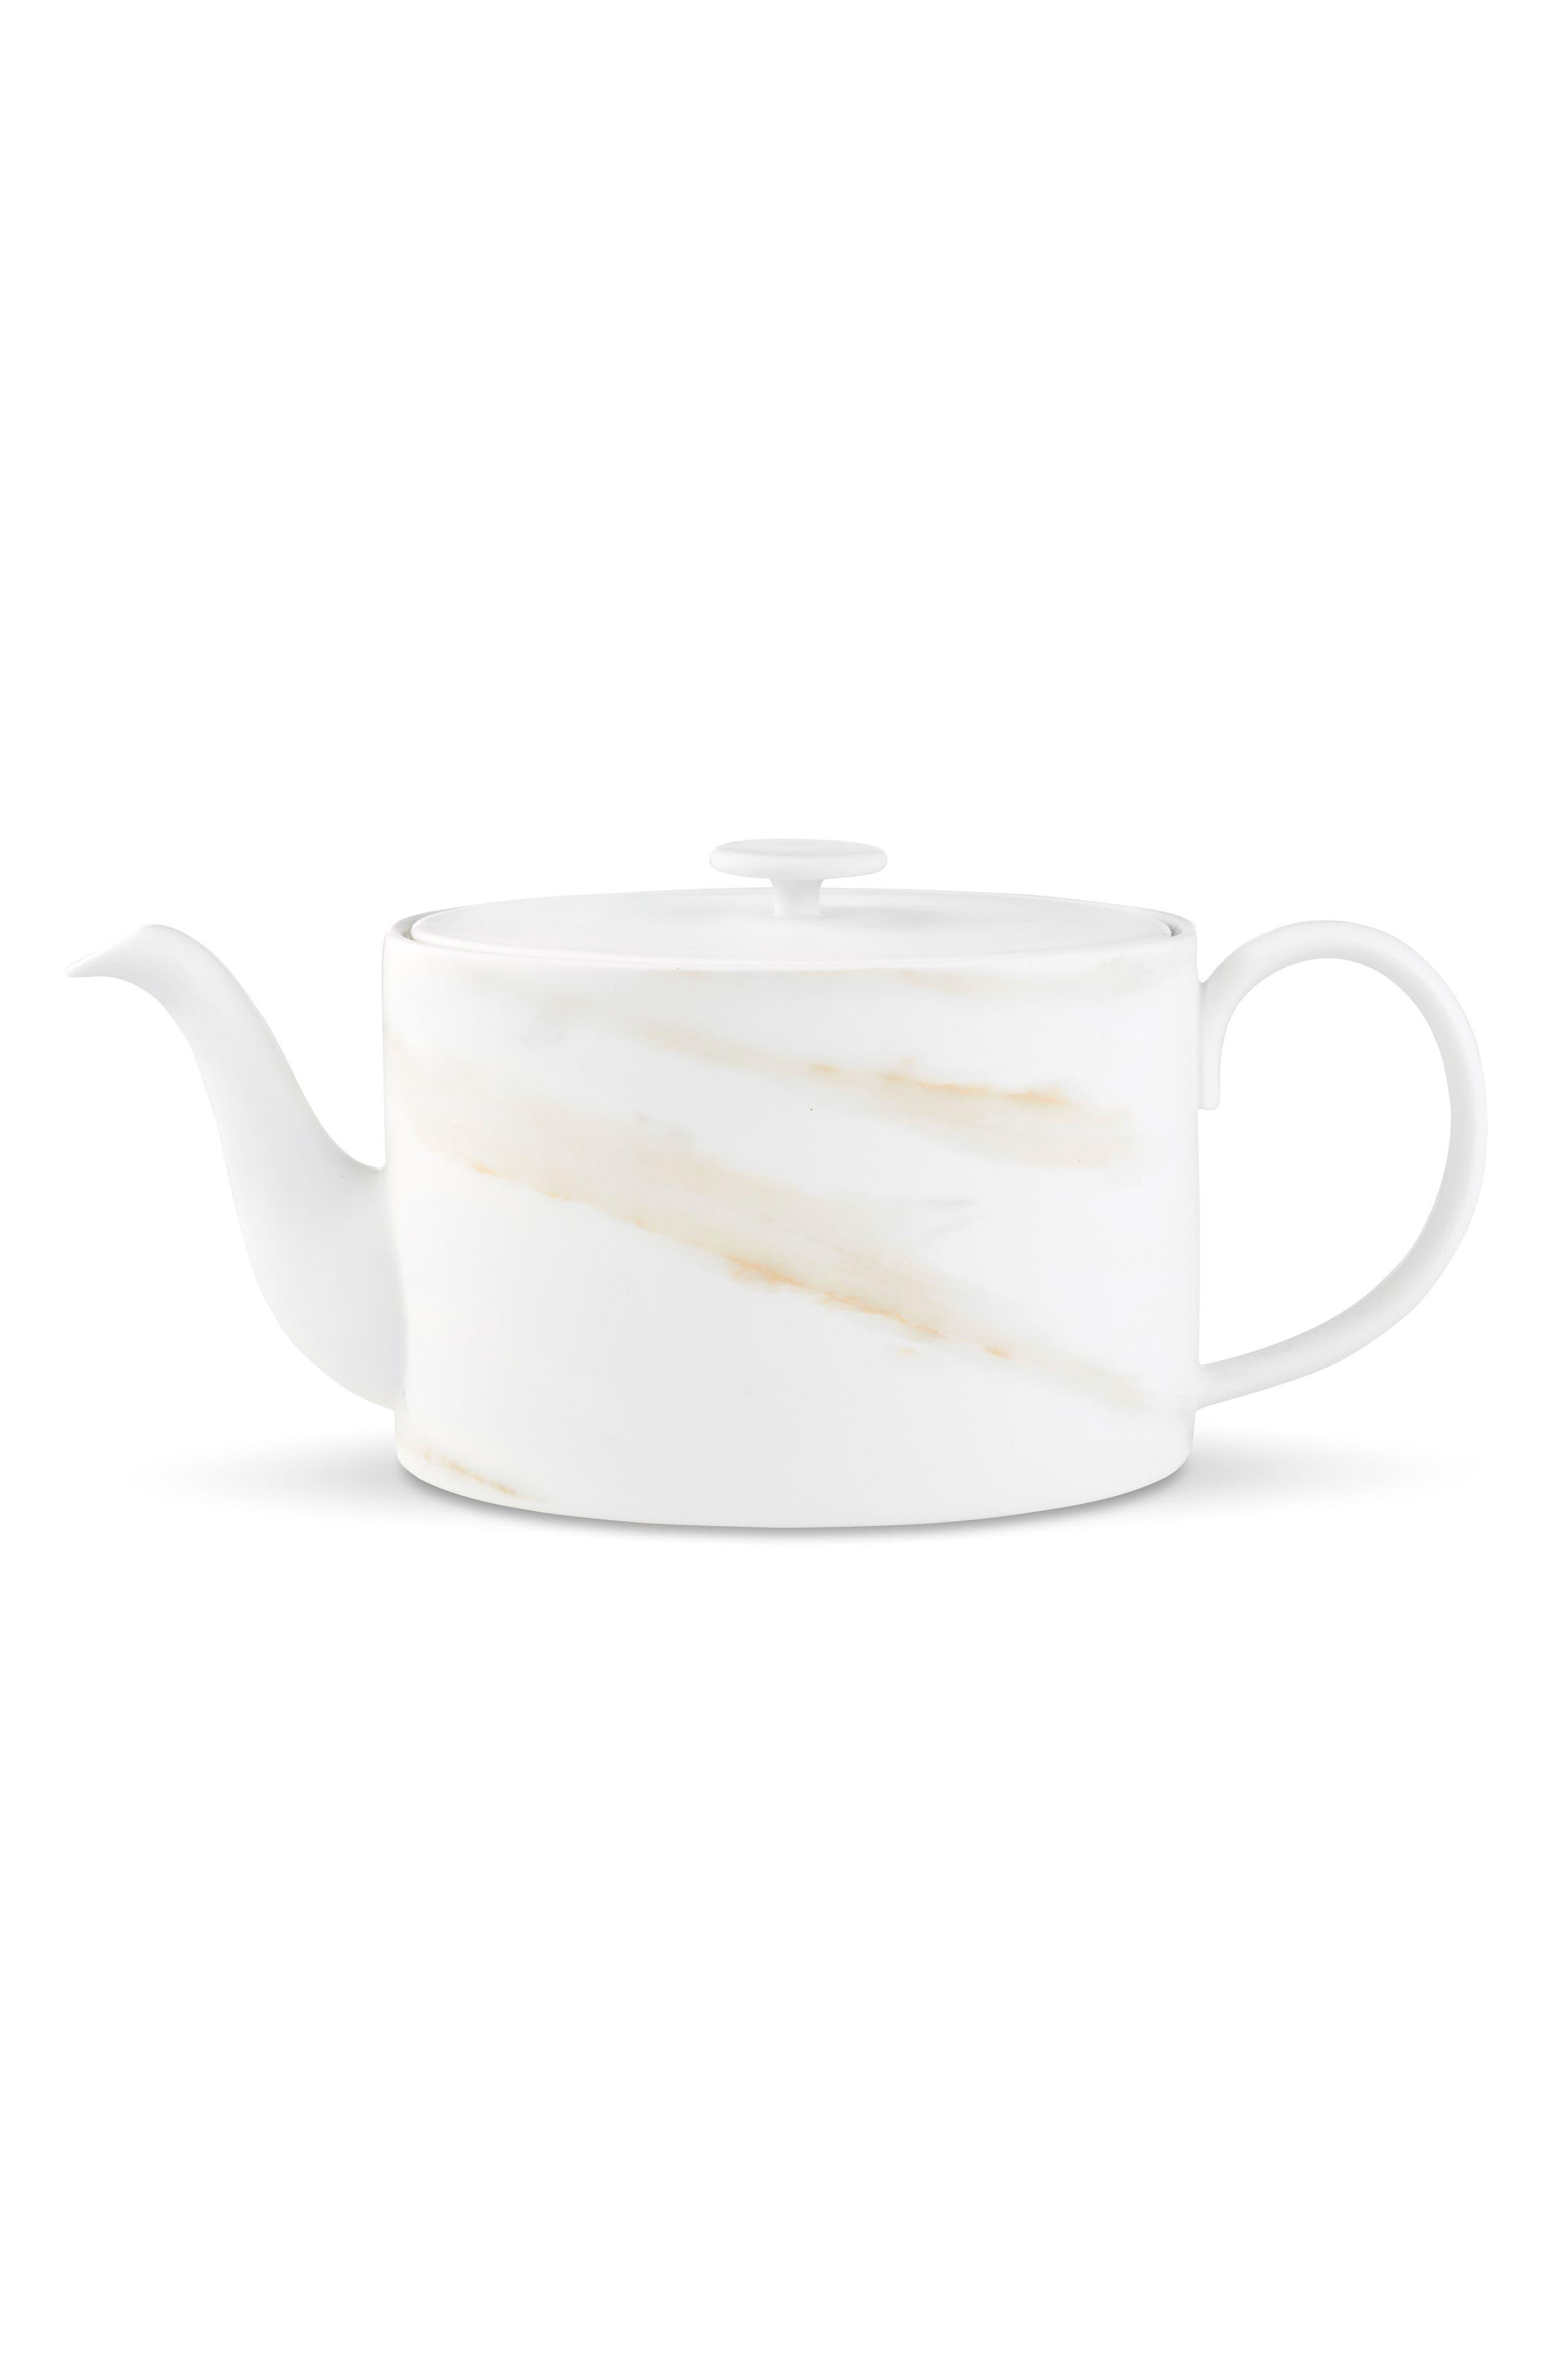 x Wedgwood Venato Imperial Teapot,                             Main thumbnail 1, color,                             100